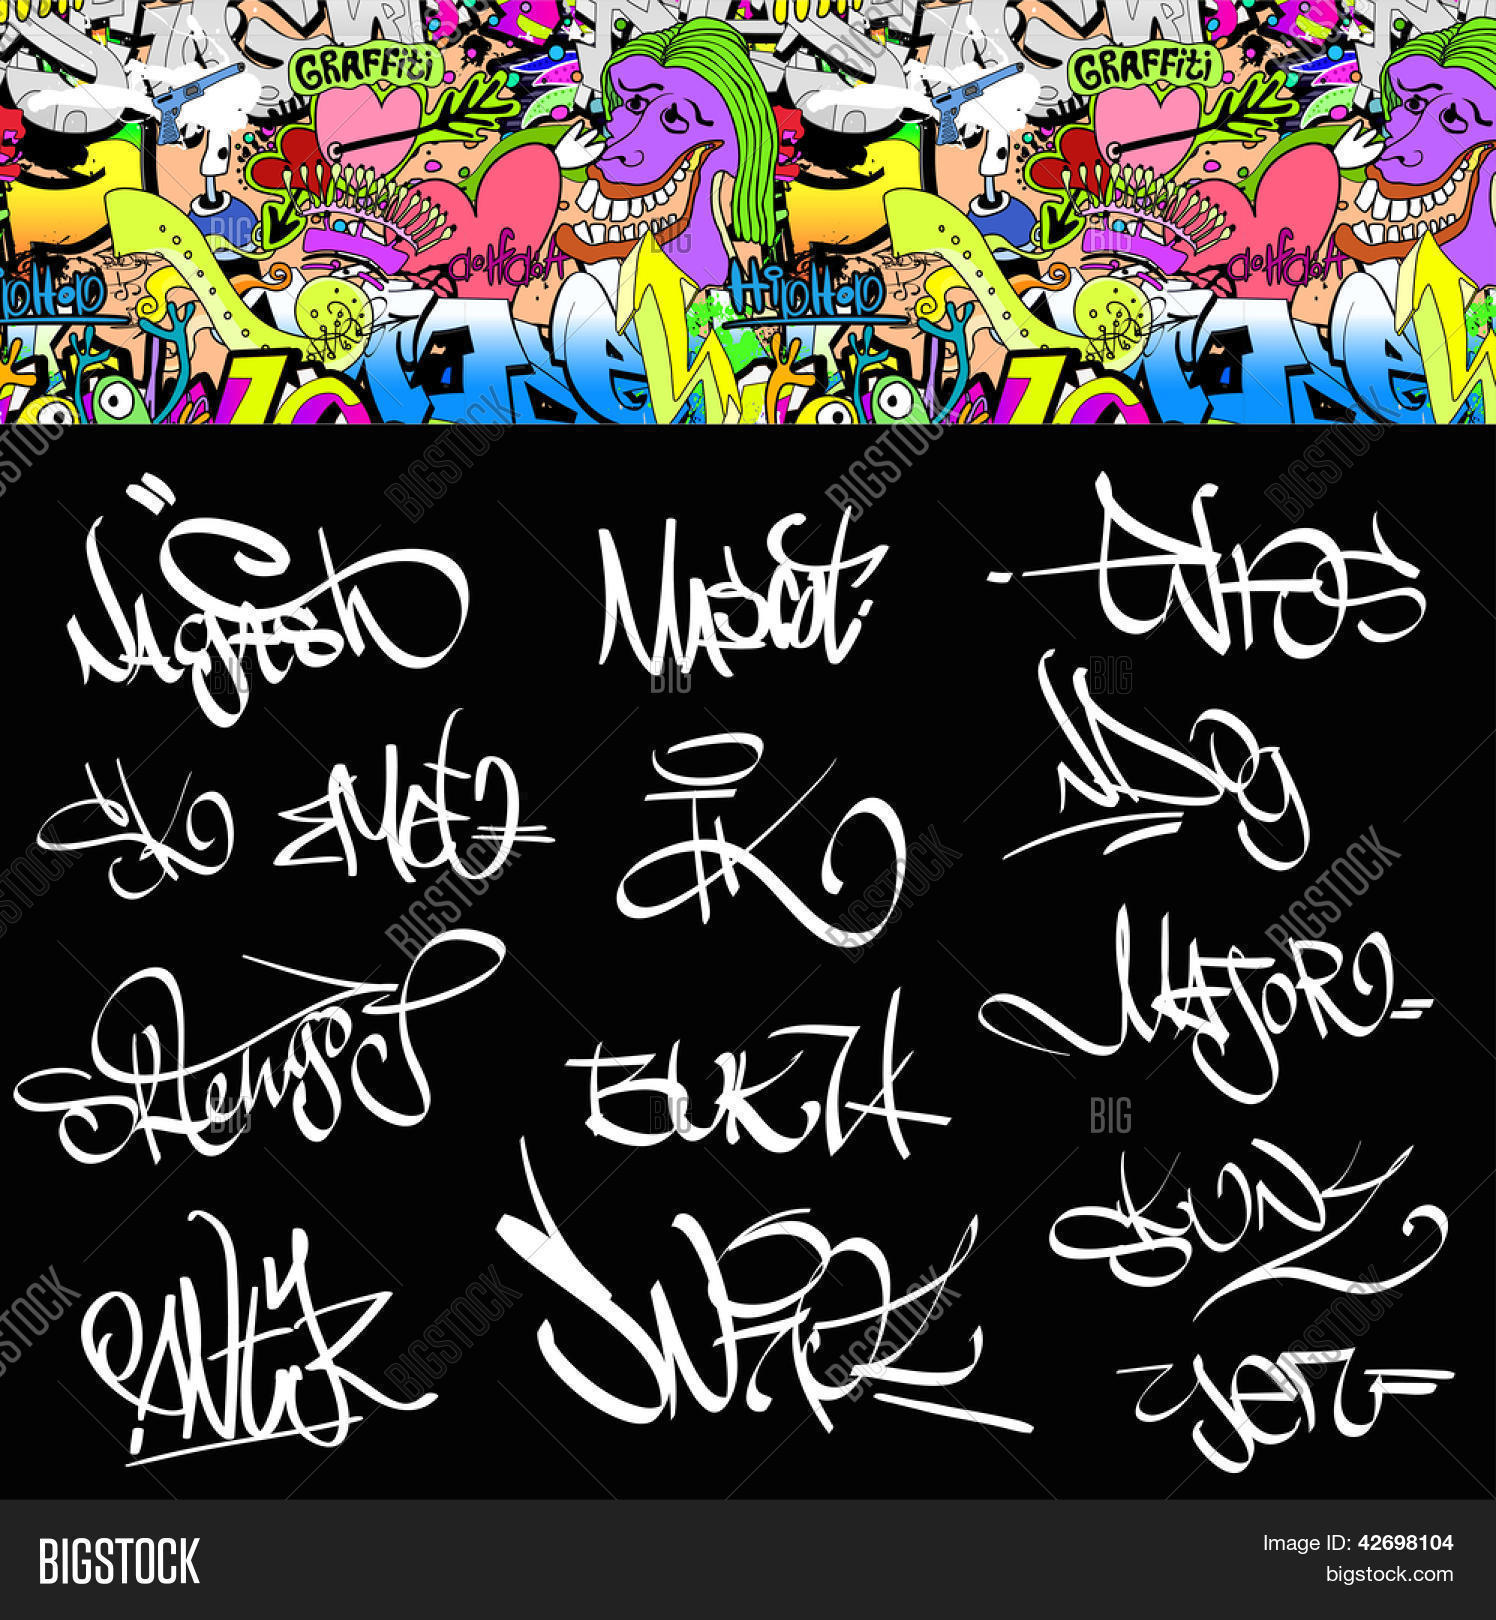 Graffiti font tags urban illustration set hip hop art design